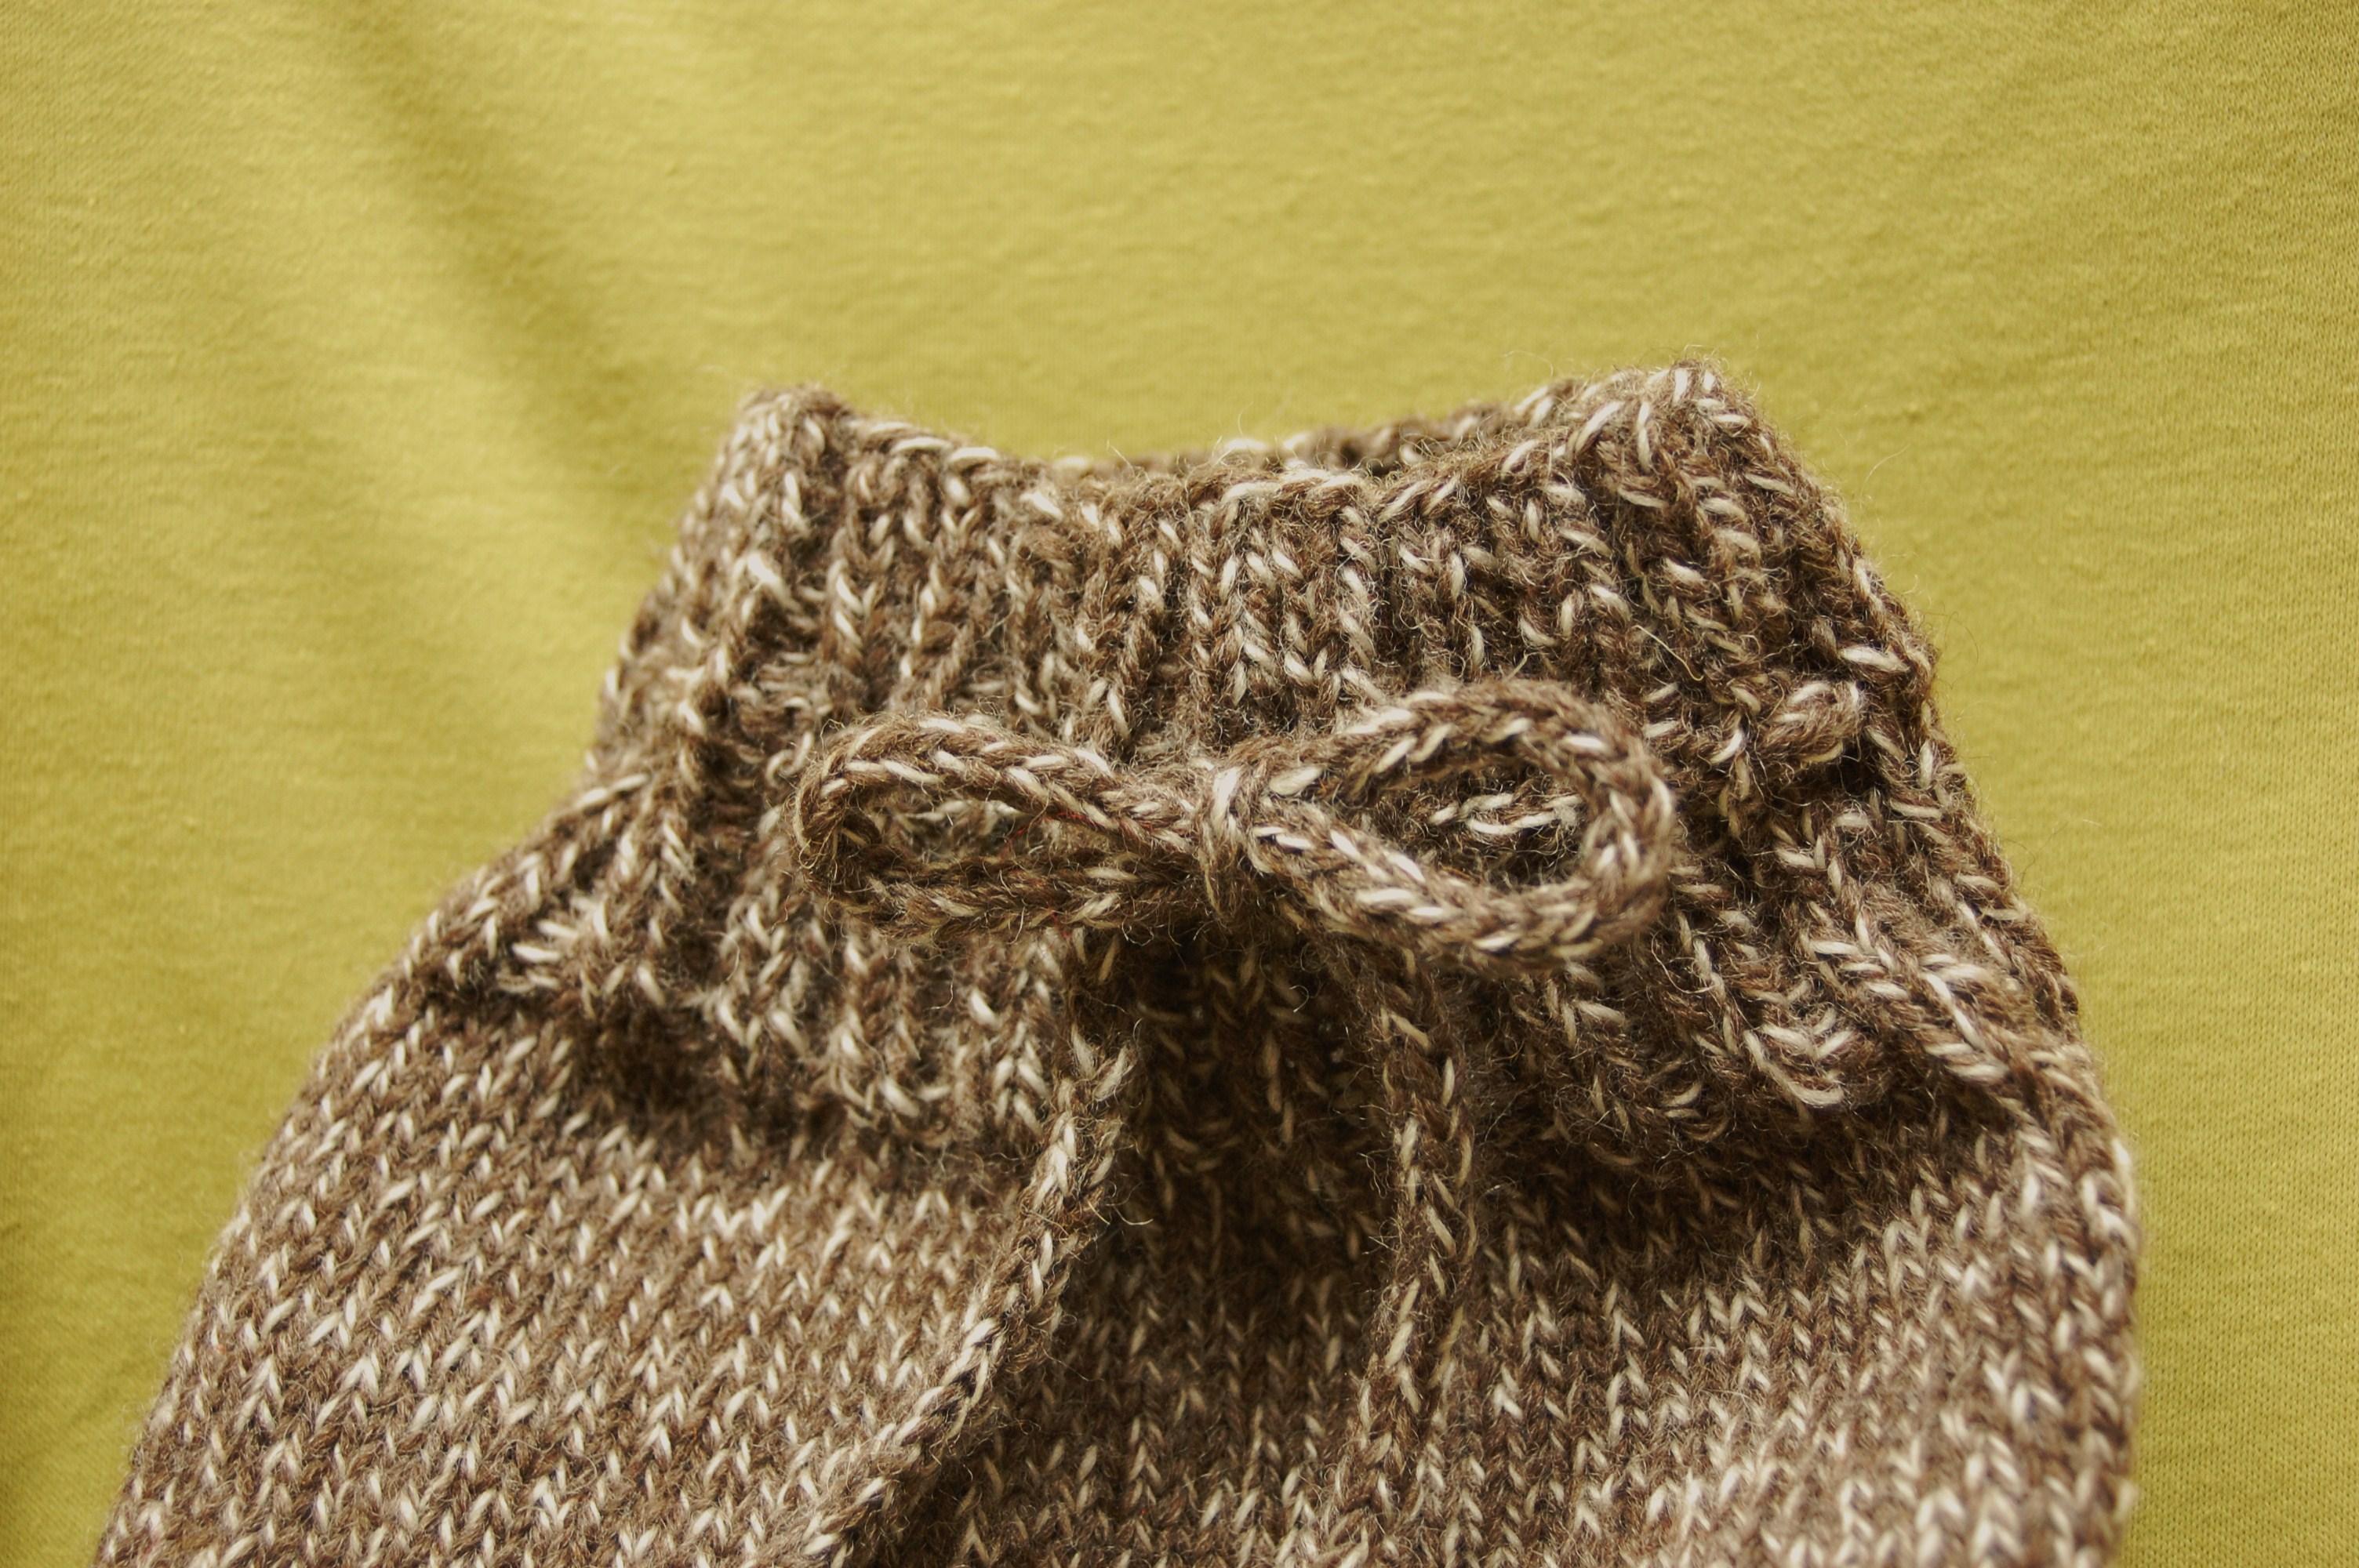 Sneak Peek At The Sock Monkey Knittybutton